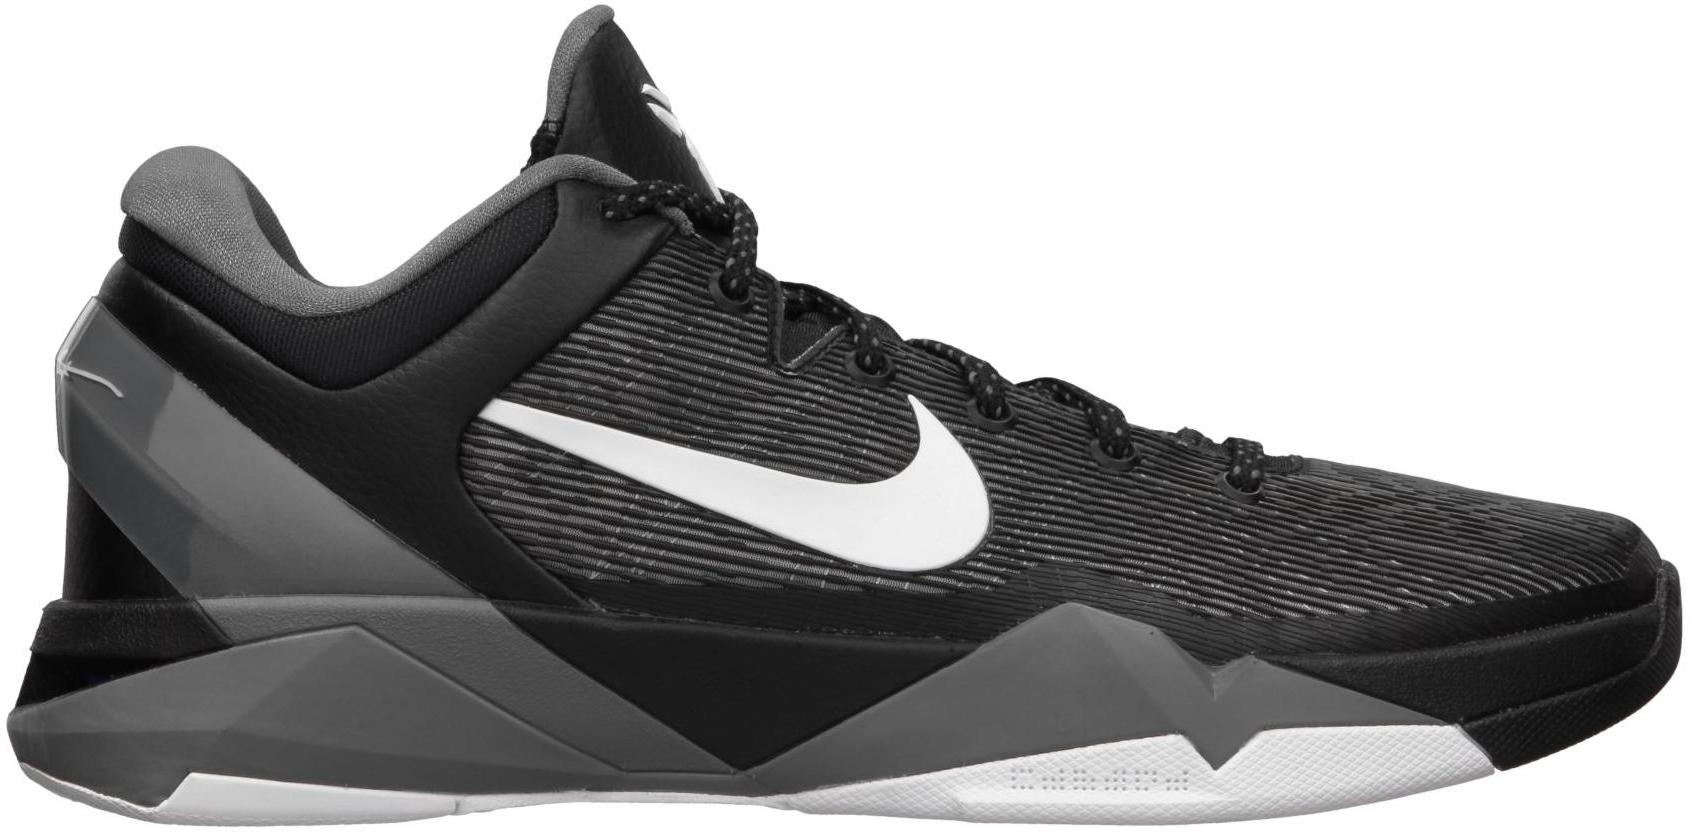 Nike Kobe 7 Black White Wolf Grey